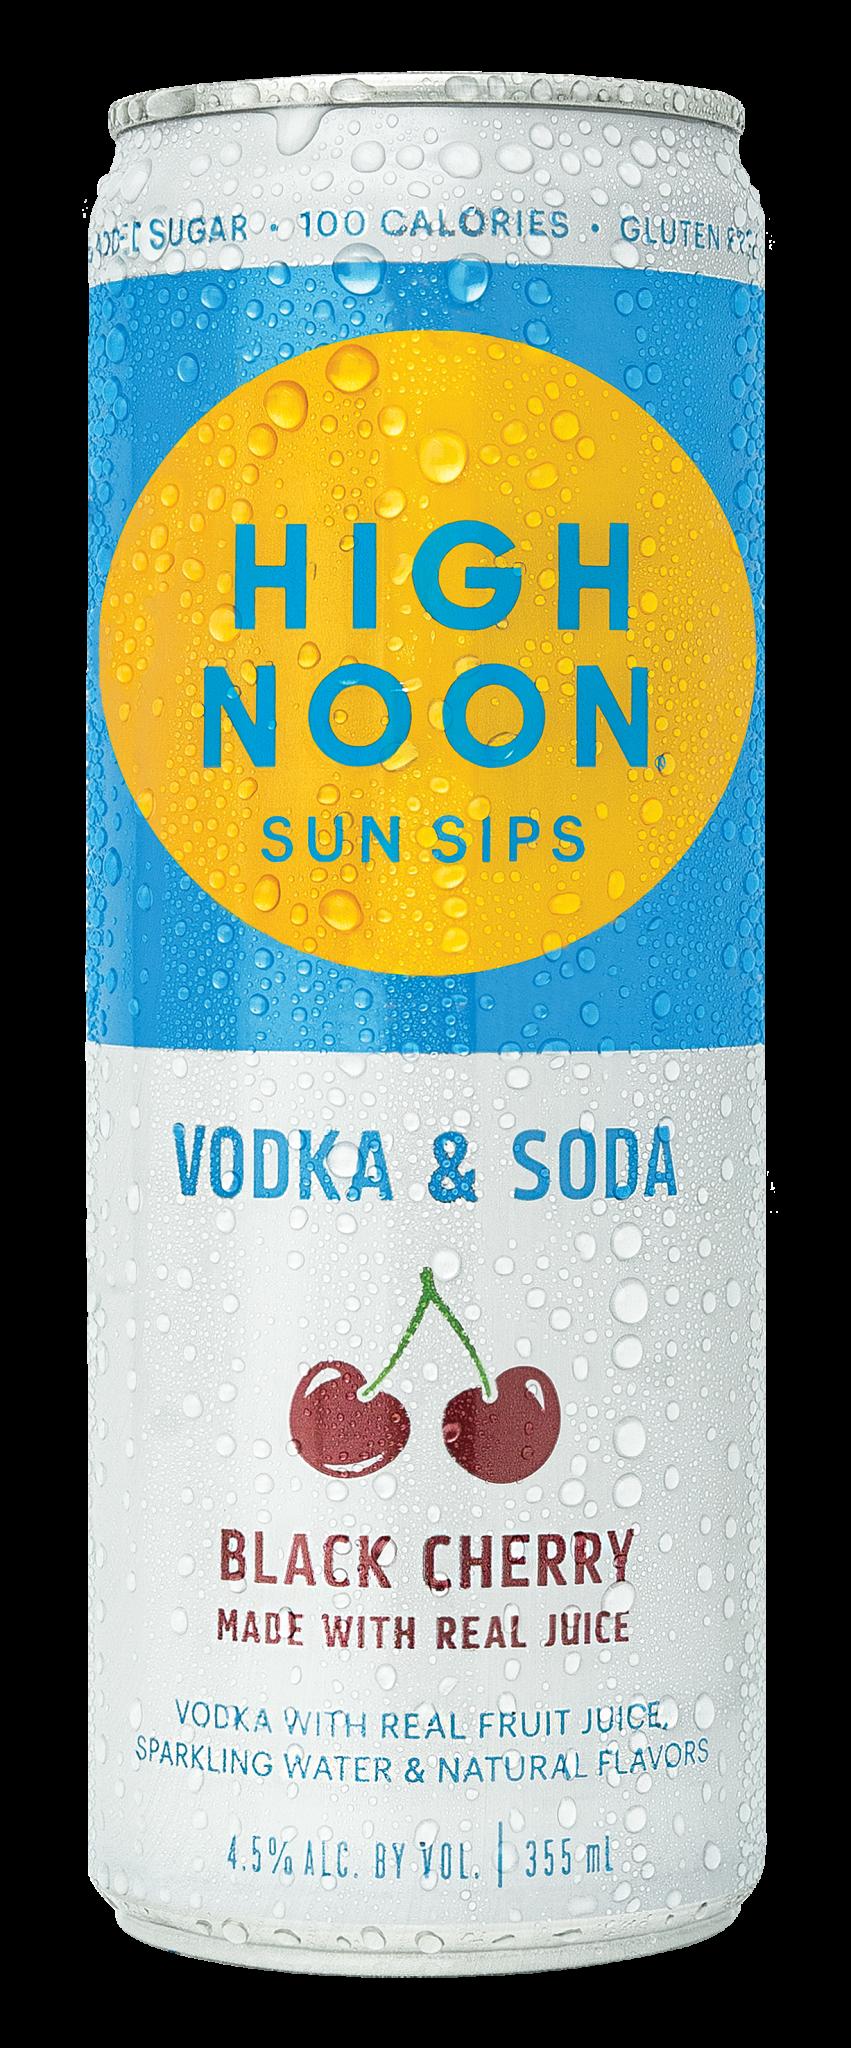 High Noon Spirits HIGH NOON VODKA SODA BLACK CHERRY 4 PK CANS